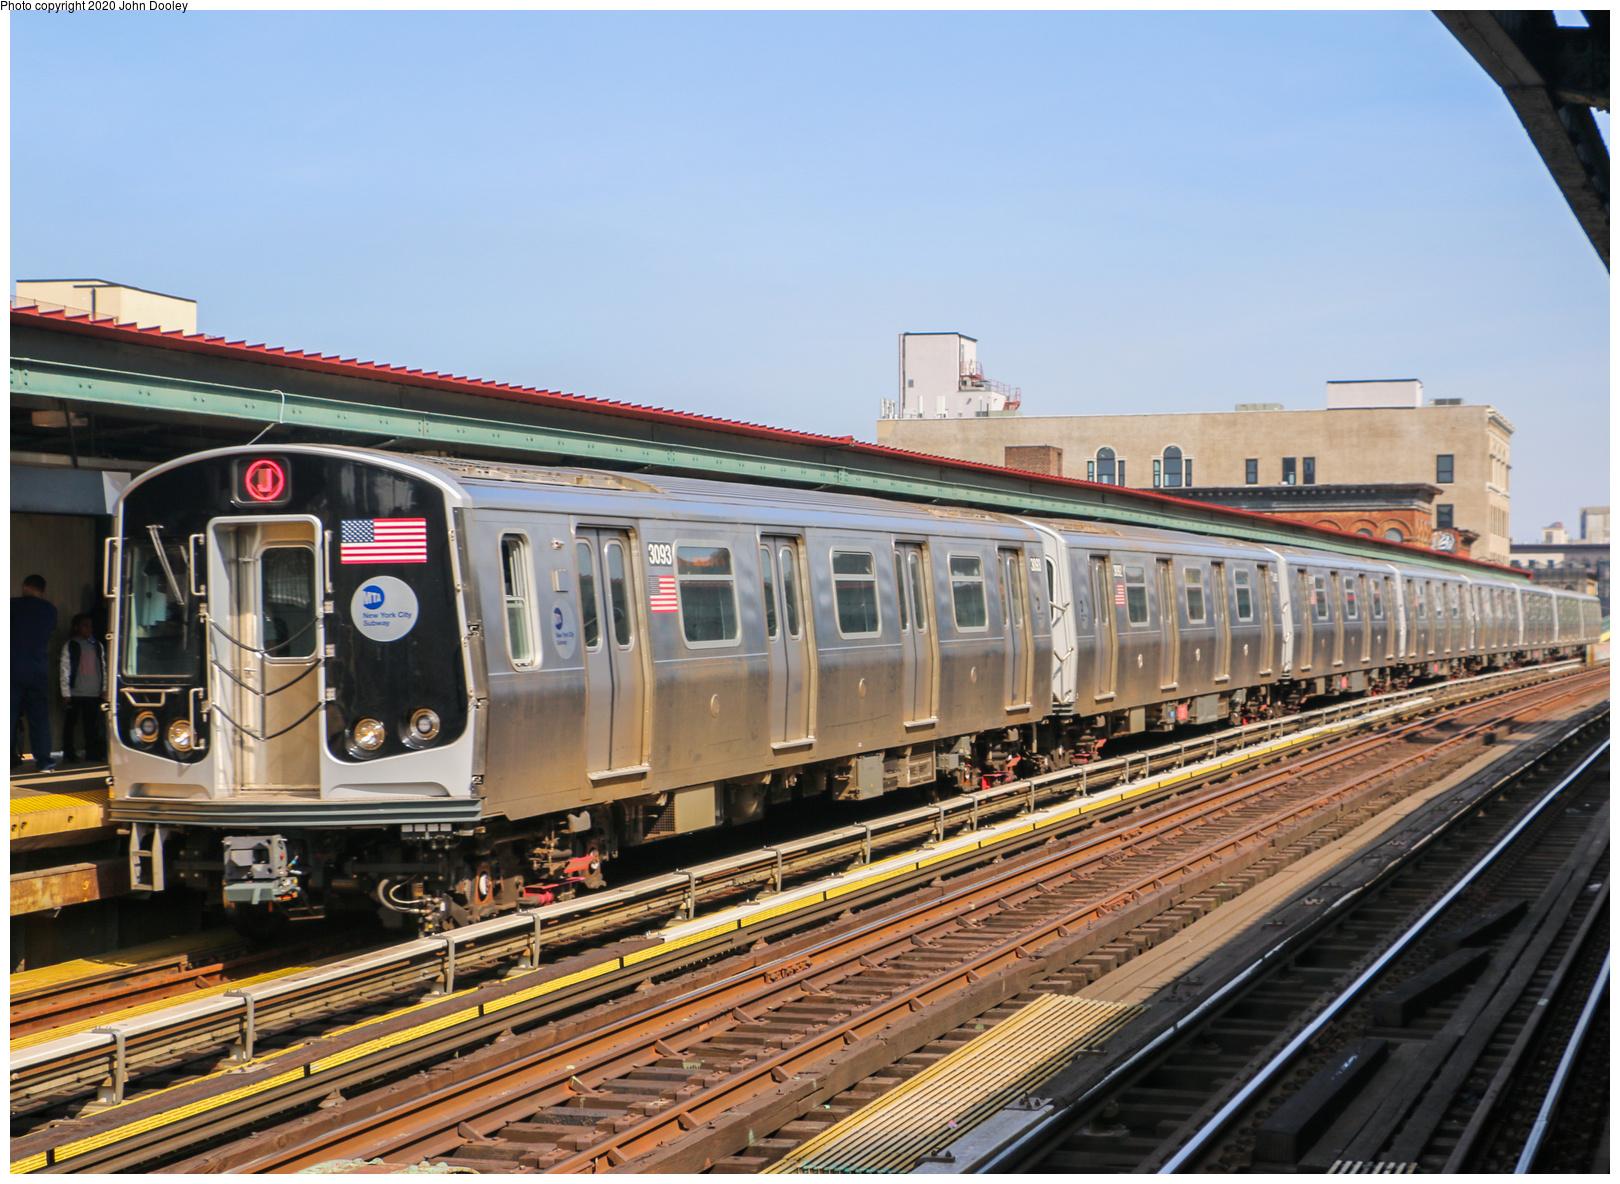 (833k, 1620x1184)<br><b>Country:</b> United States<br><b>City:</b> New York<br><b>System:</b> New York City Transit<br><b>Line:</b> BMT Nassau Street/Jamaica Line<br><b>Location:</b> Flushing Avenue <br><b>Route:</b> J<br><b>Car:</b> R-179 (Bombardier, 2016-2019) 3093 <br><b>Photo by:</b> John Dooley<br><b>Date:</b> 5/14/2018<br><b>Viewed (this week/total):</b> 9 / 44